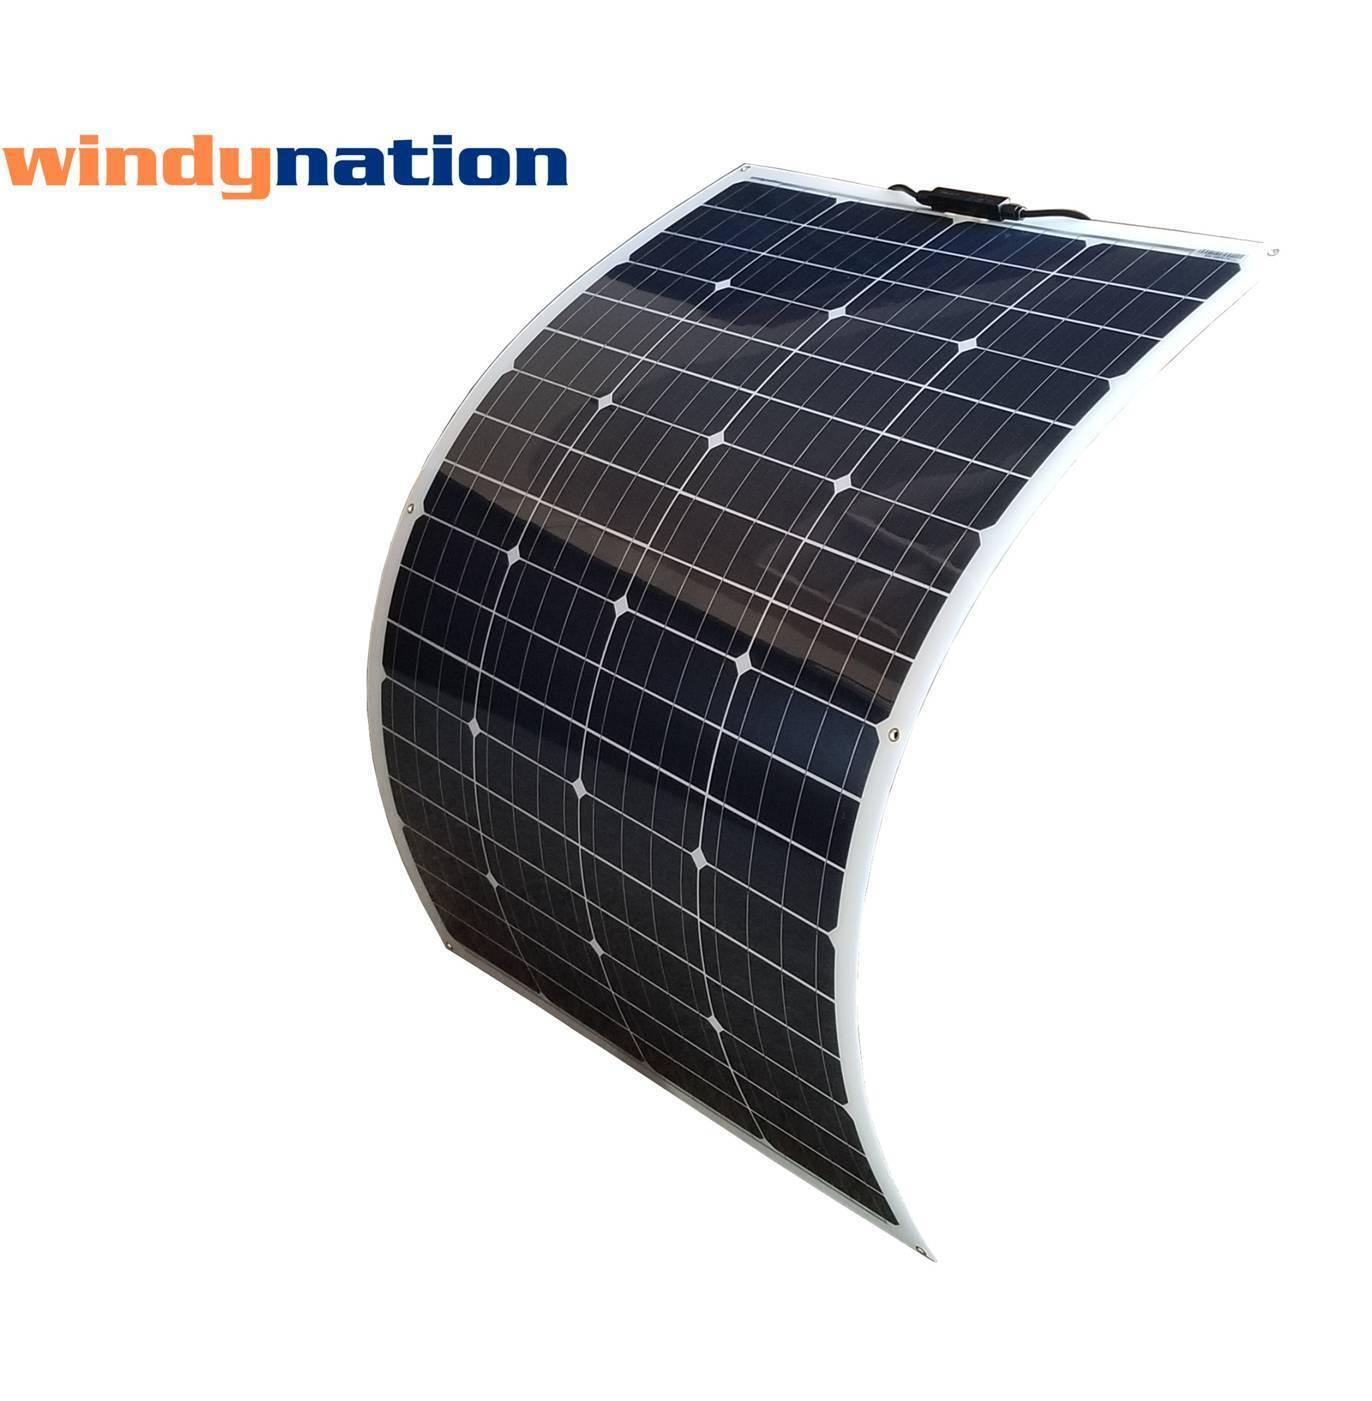 WindyNation 100 Watt 12V Flexible Solar Panel with Monocryst